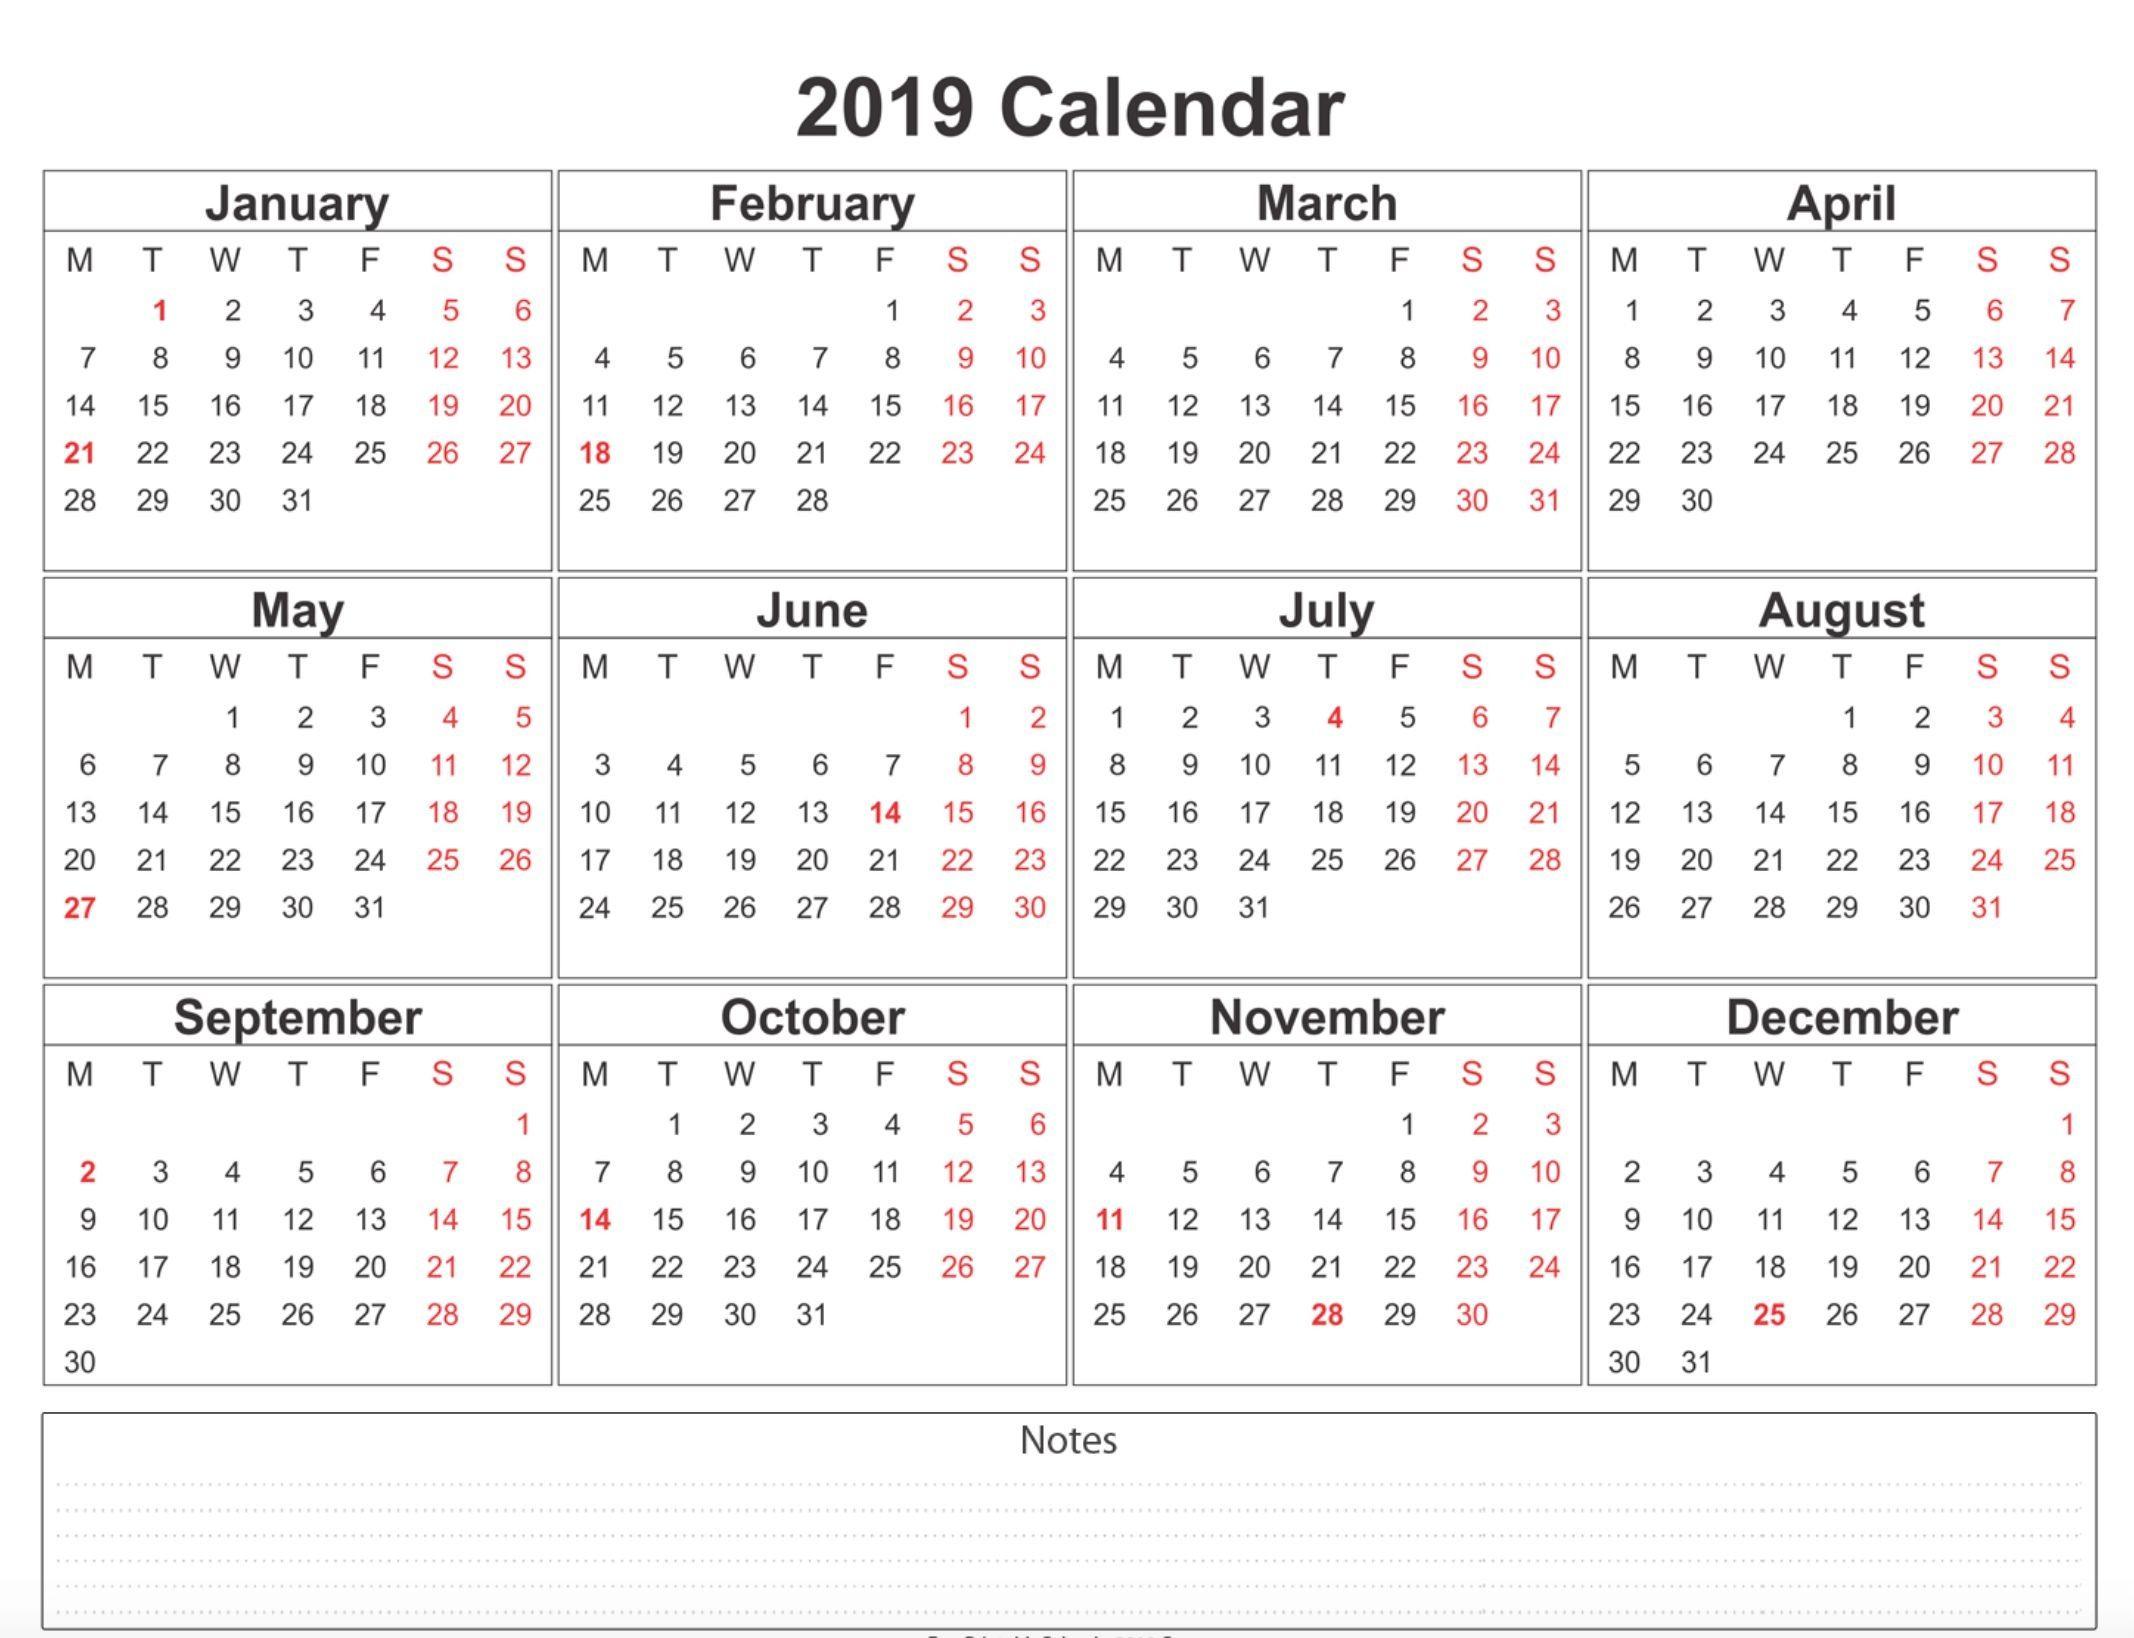 2019 Weekly Calendar Printable | 2019 Calendars | Calendar